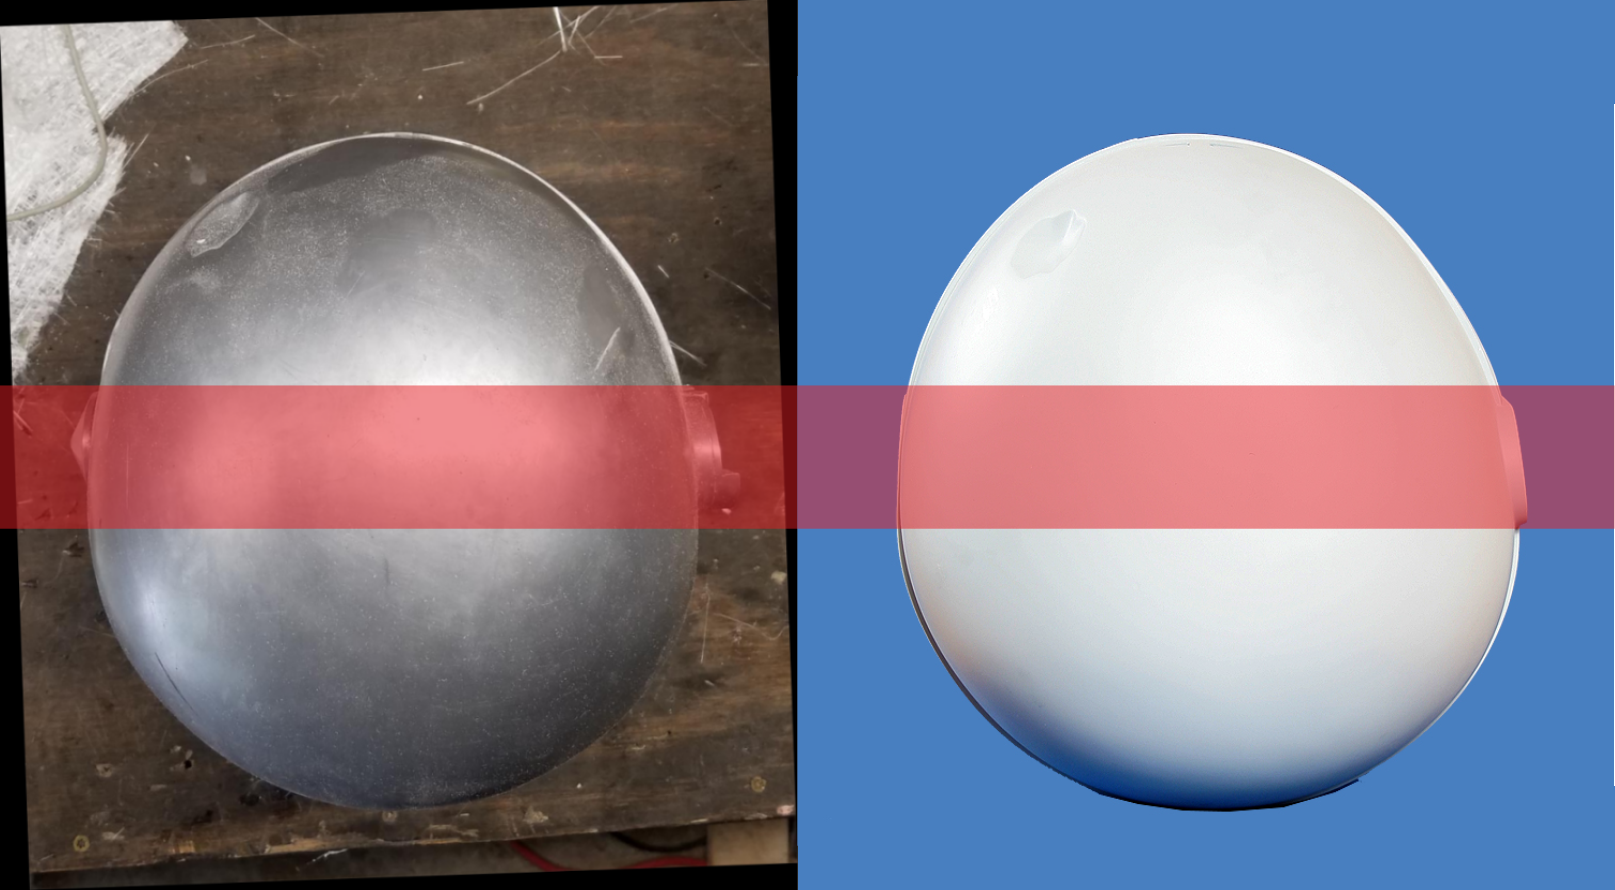 Asok & MR Helmet Compare.png